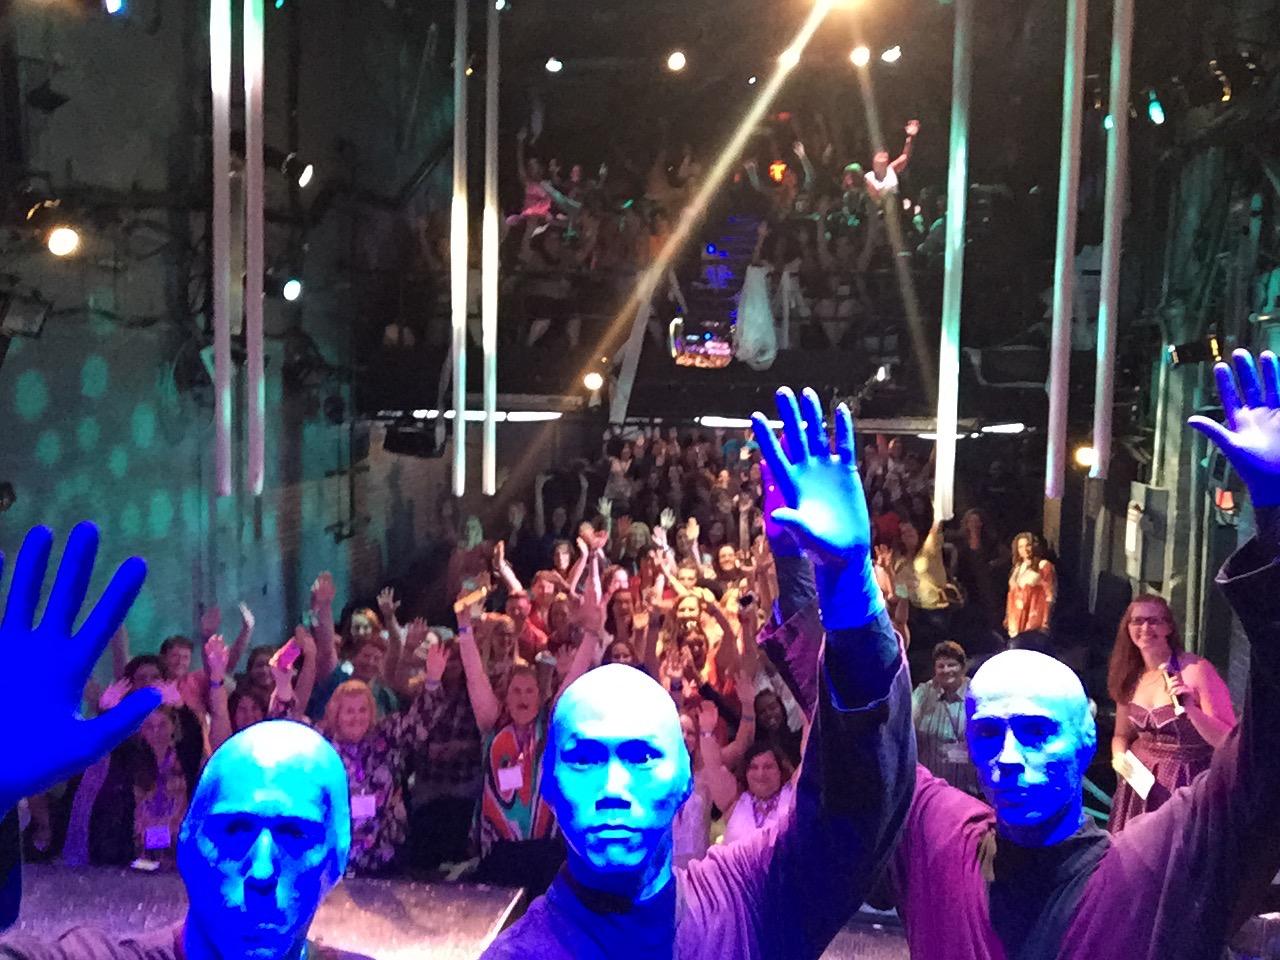 BLUE MAN GROUP - THE CURRENT LYRICS